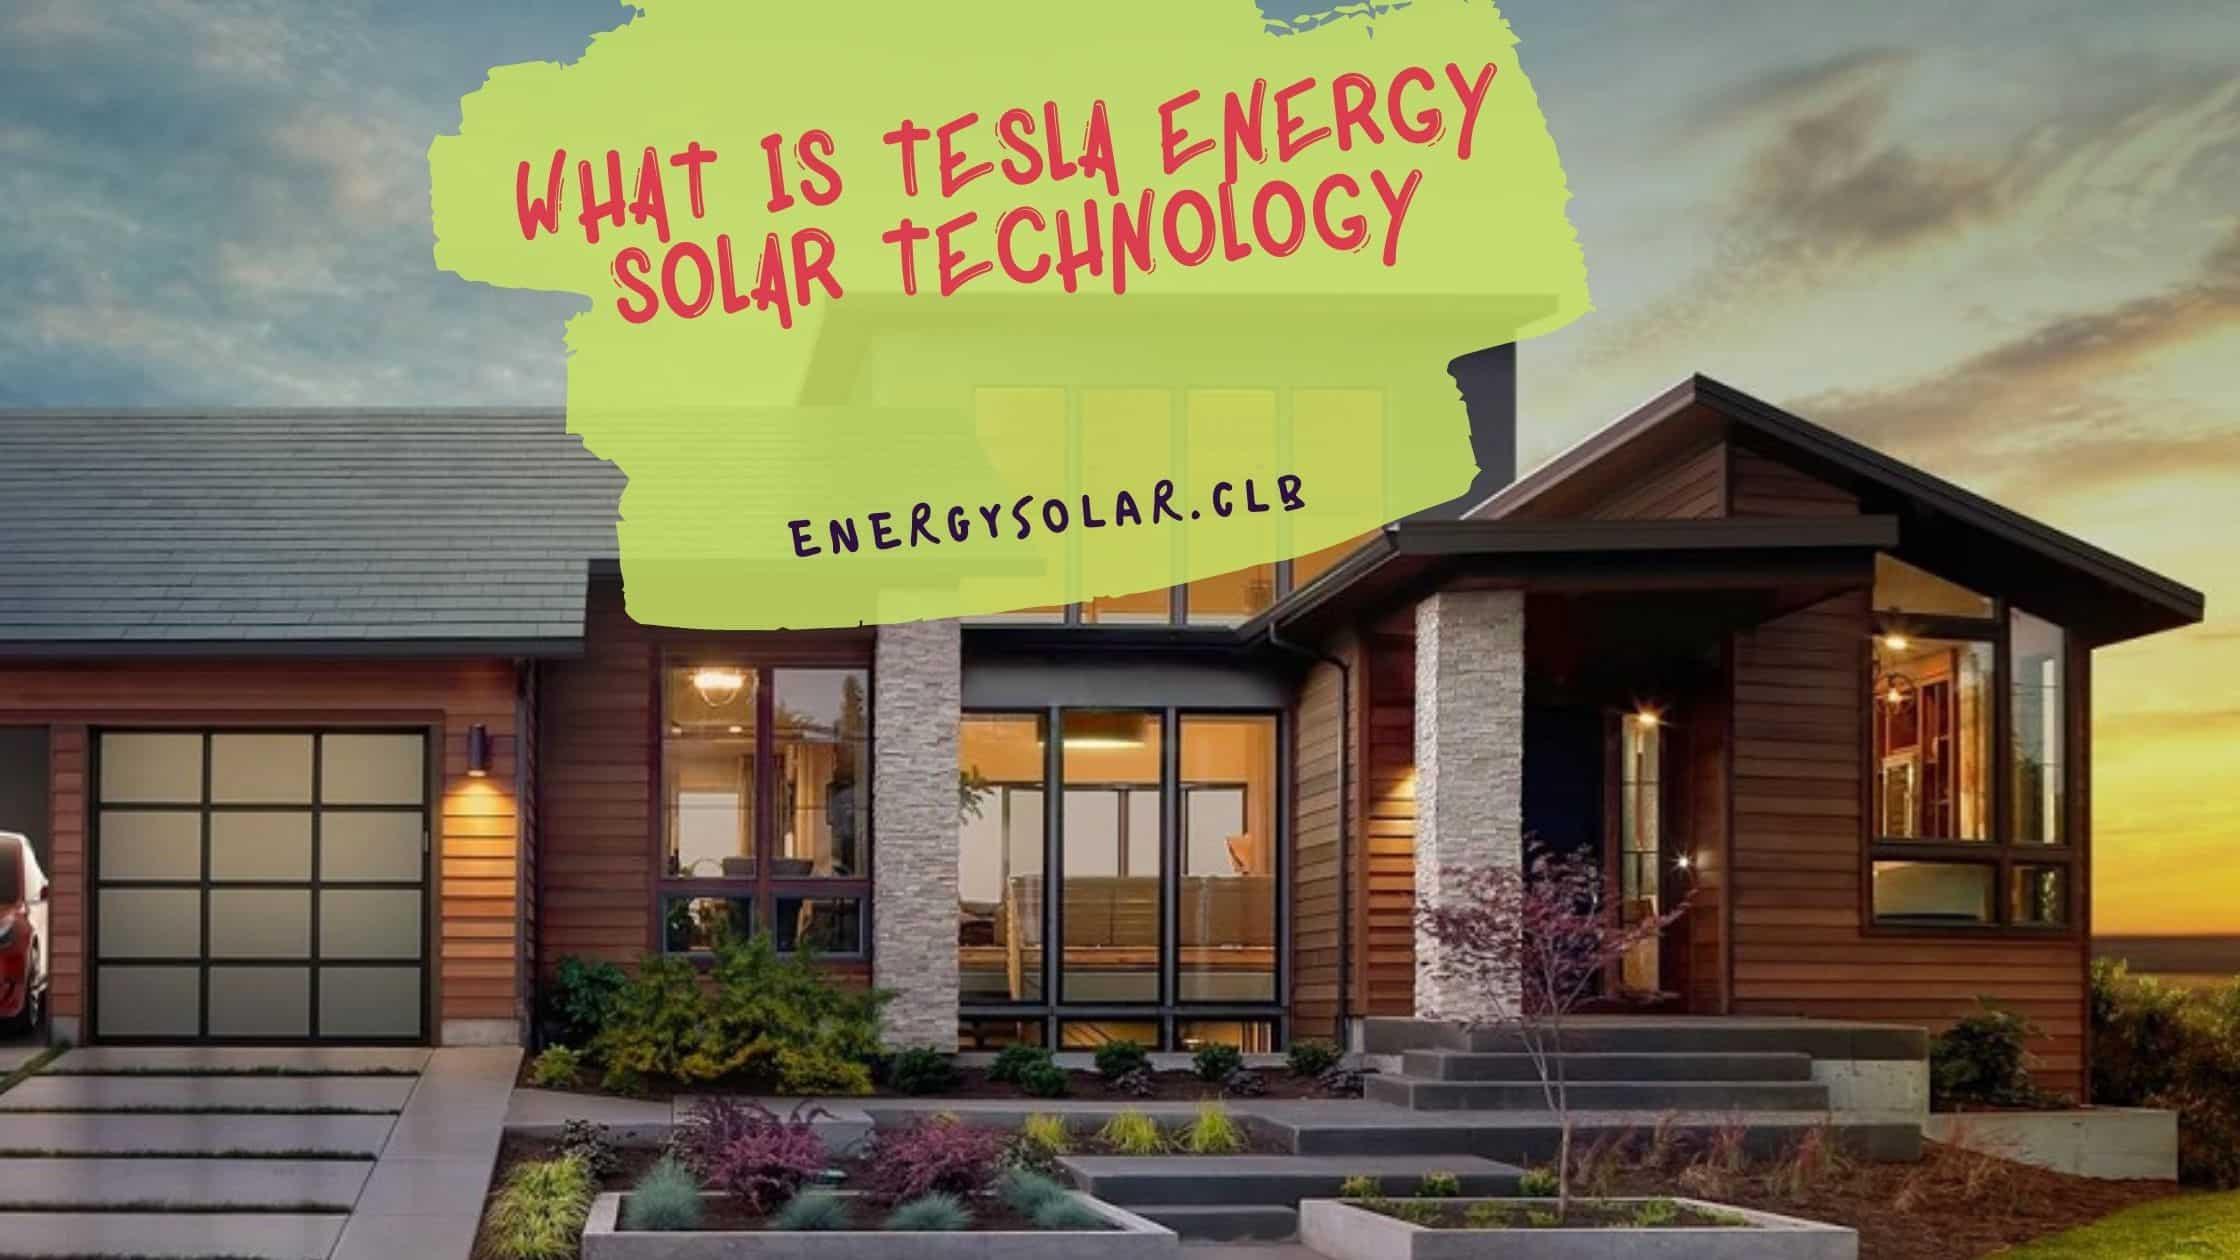 What is Tesla Energy Solar Technology